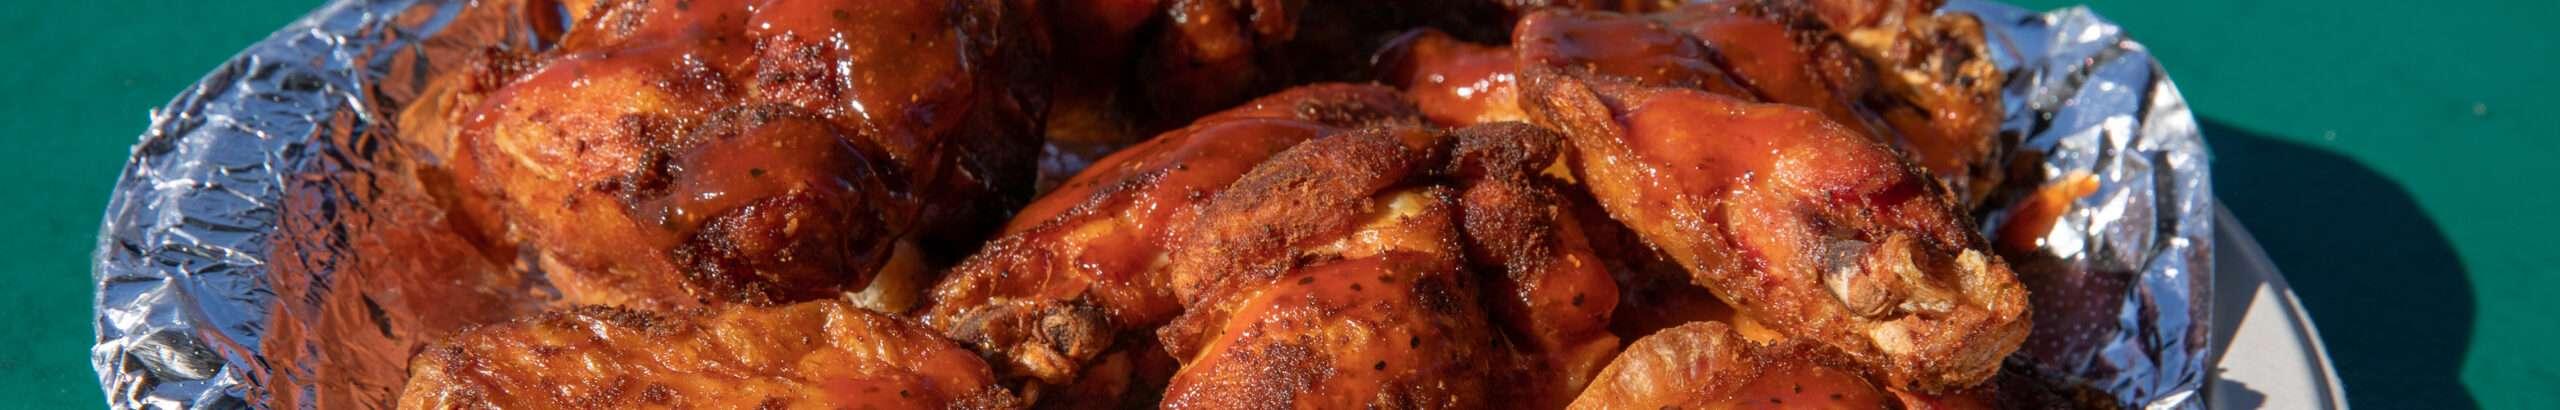 Smokey Chicken Wings